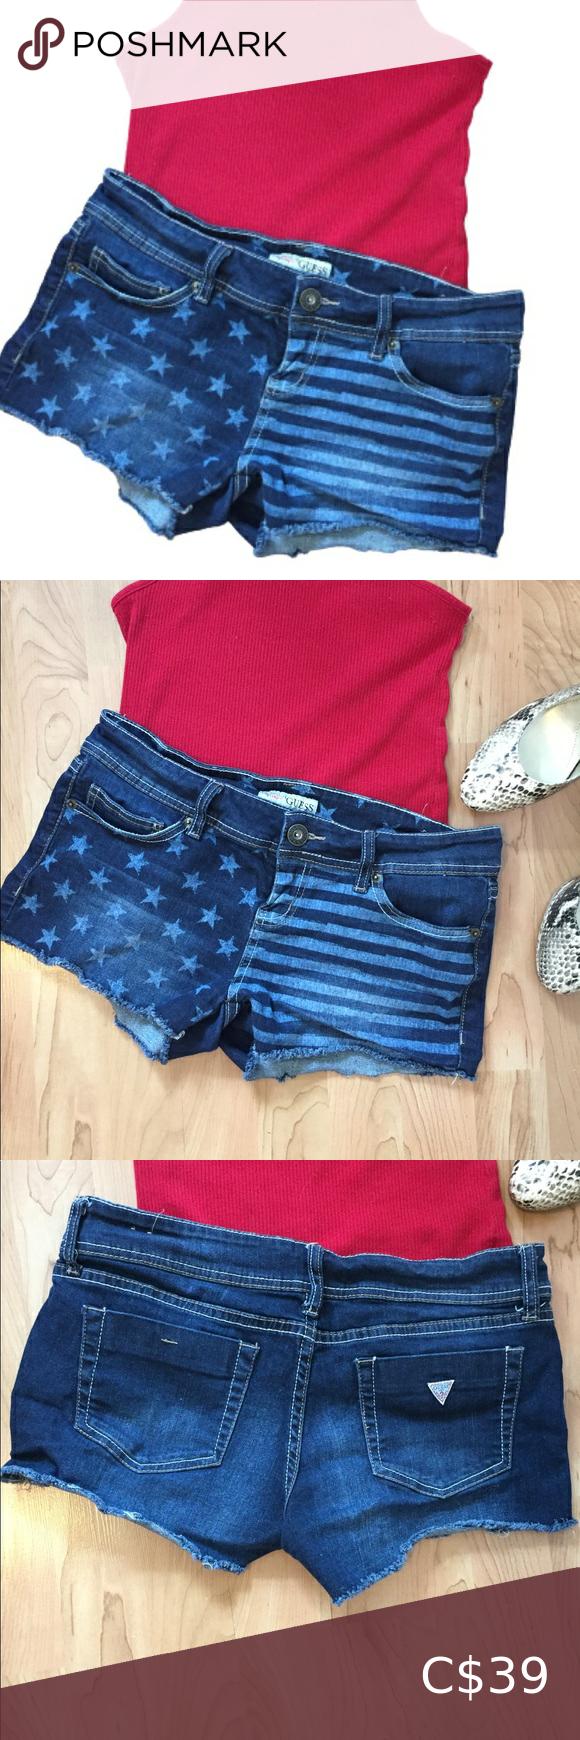 Guess Jeans Short Shorts